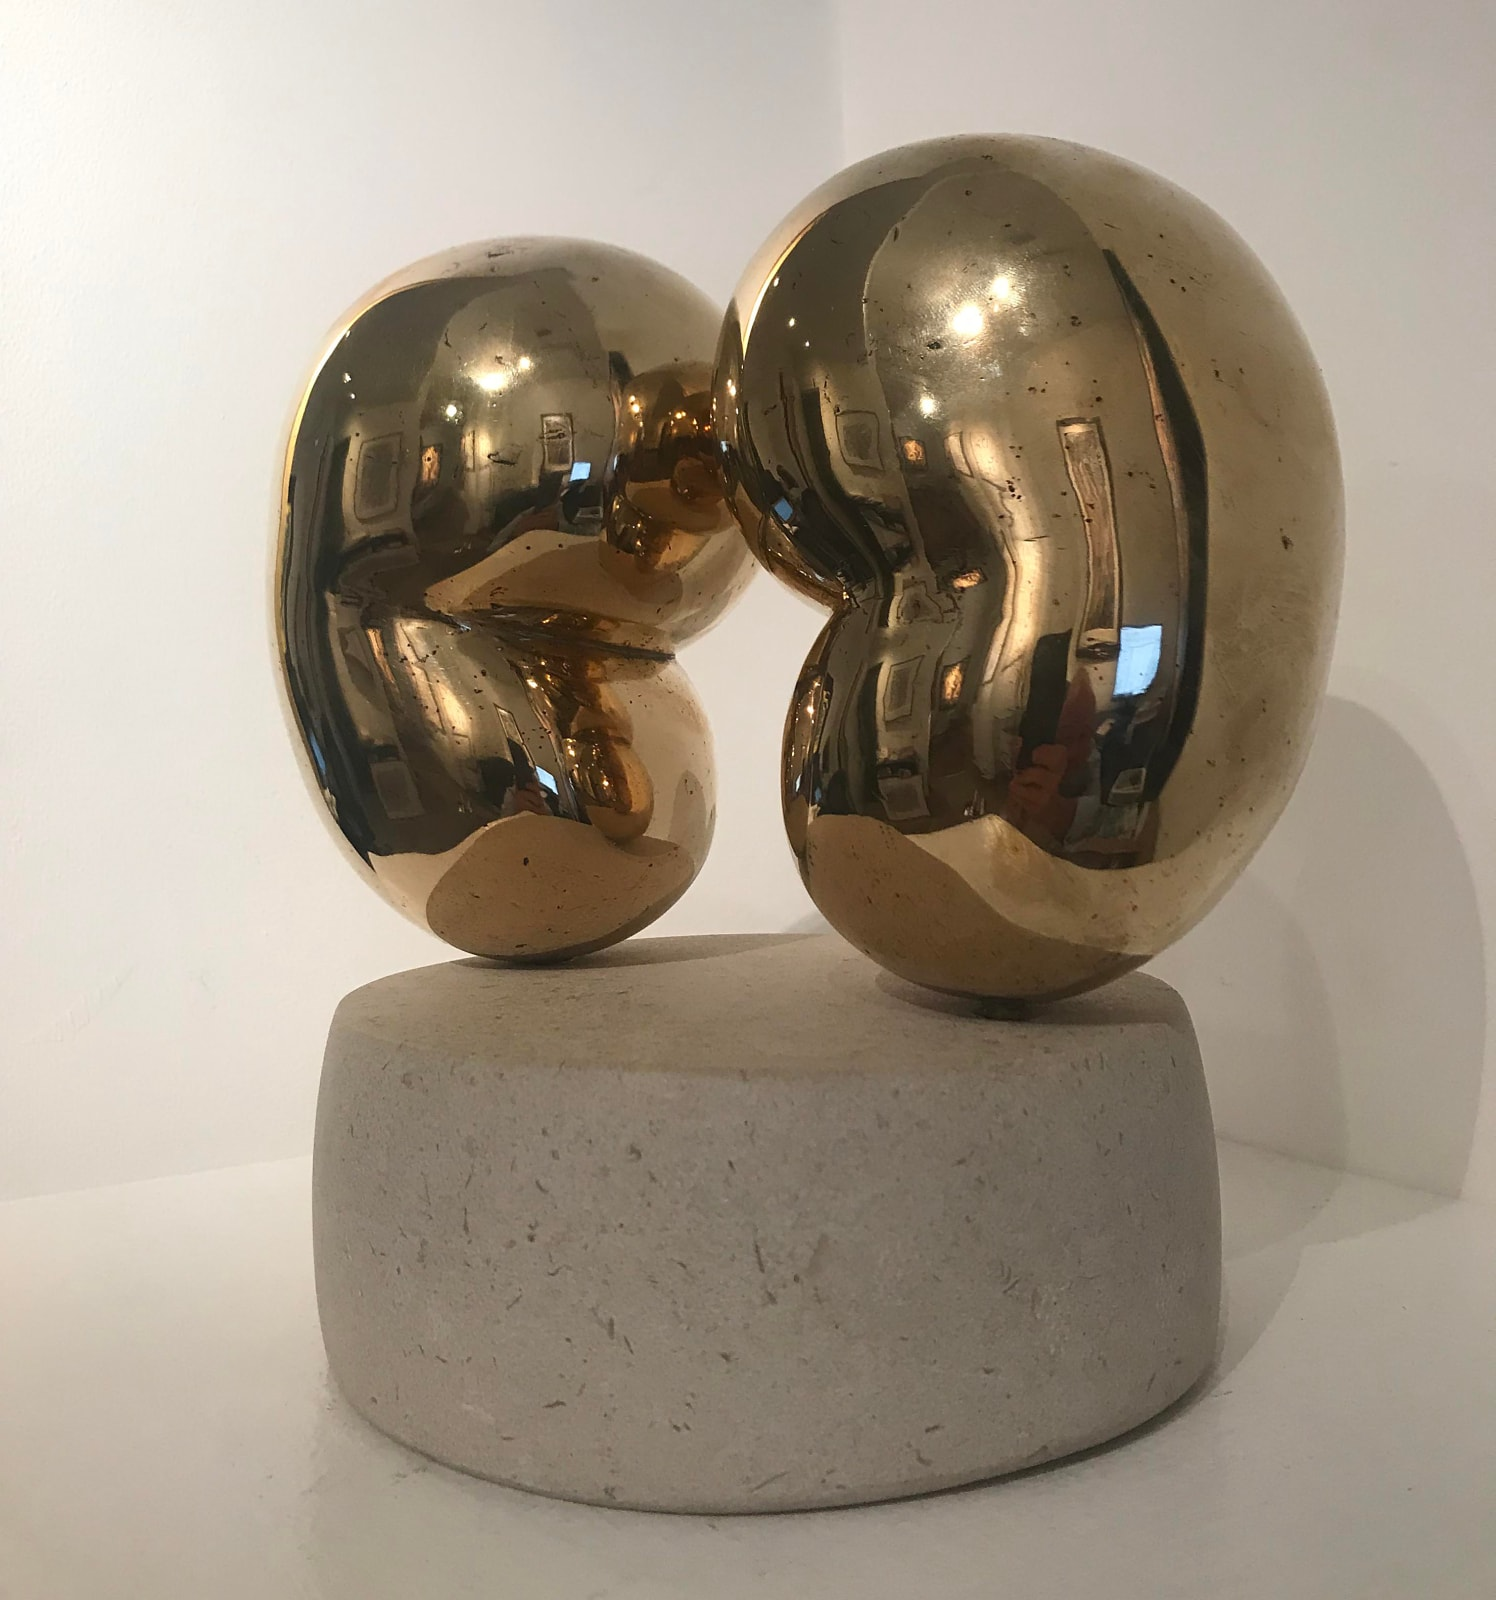 Leonard Mccomb, Two Forms, 1983